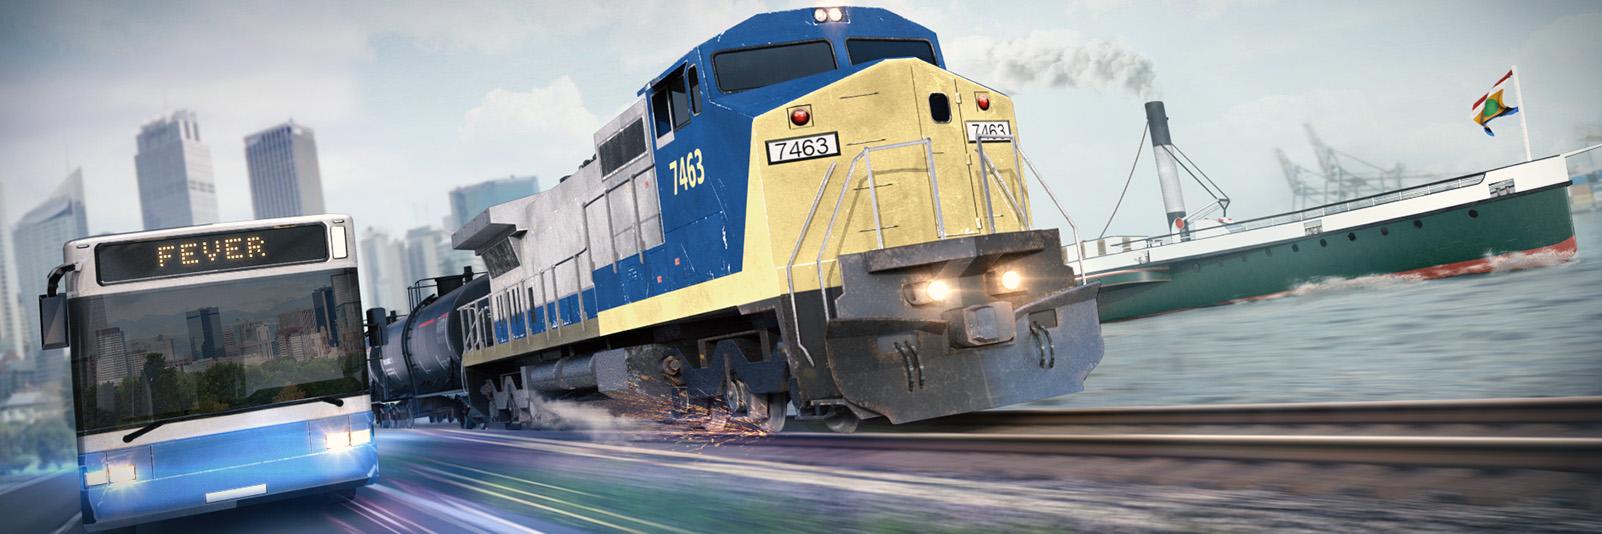 9 Best transport management PC games as of 2019 - Slant